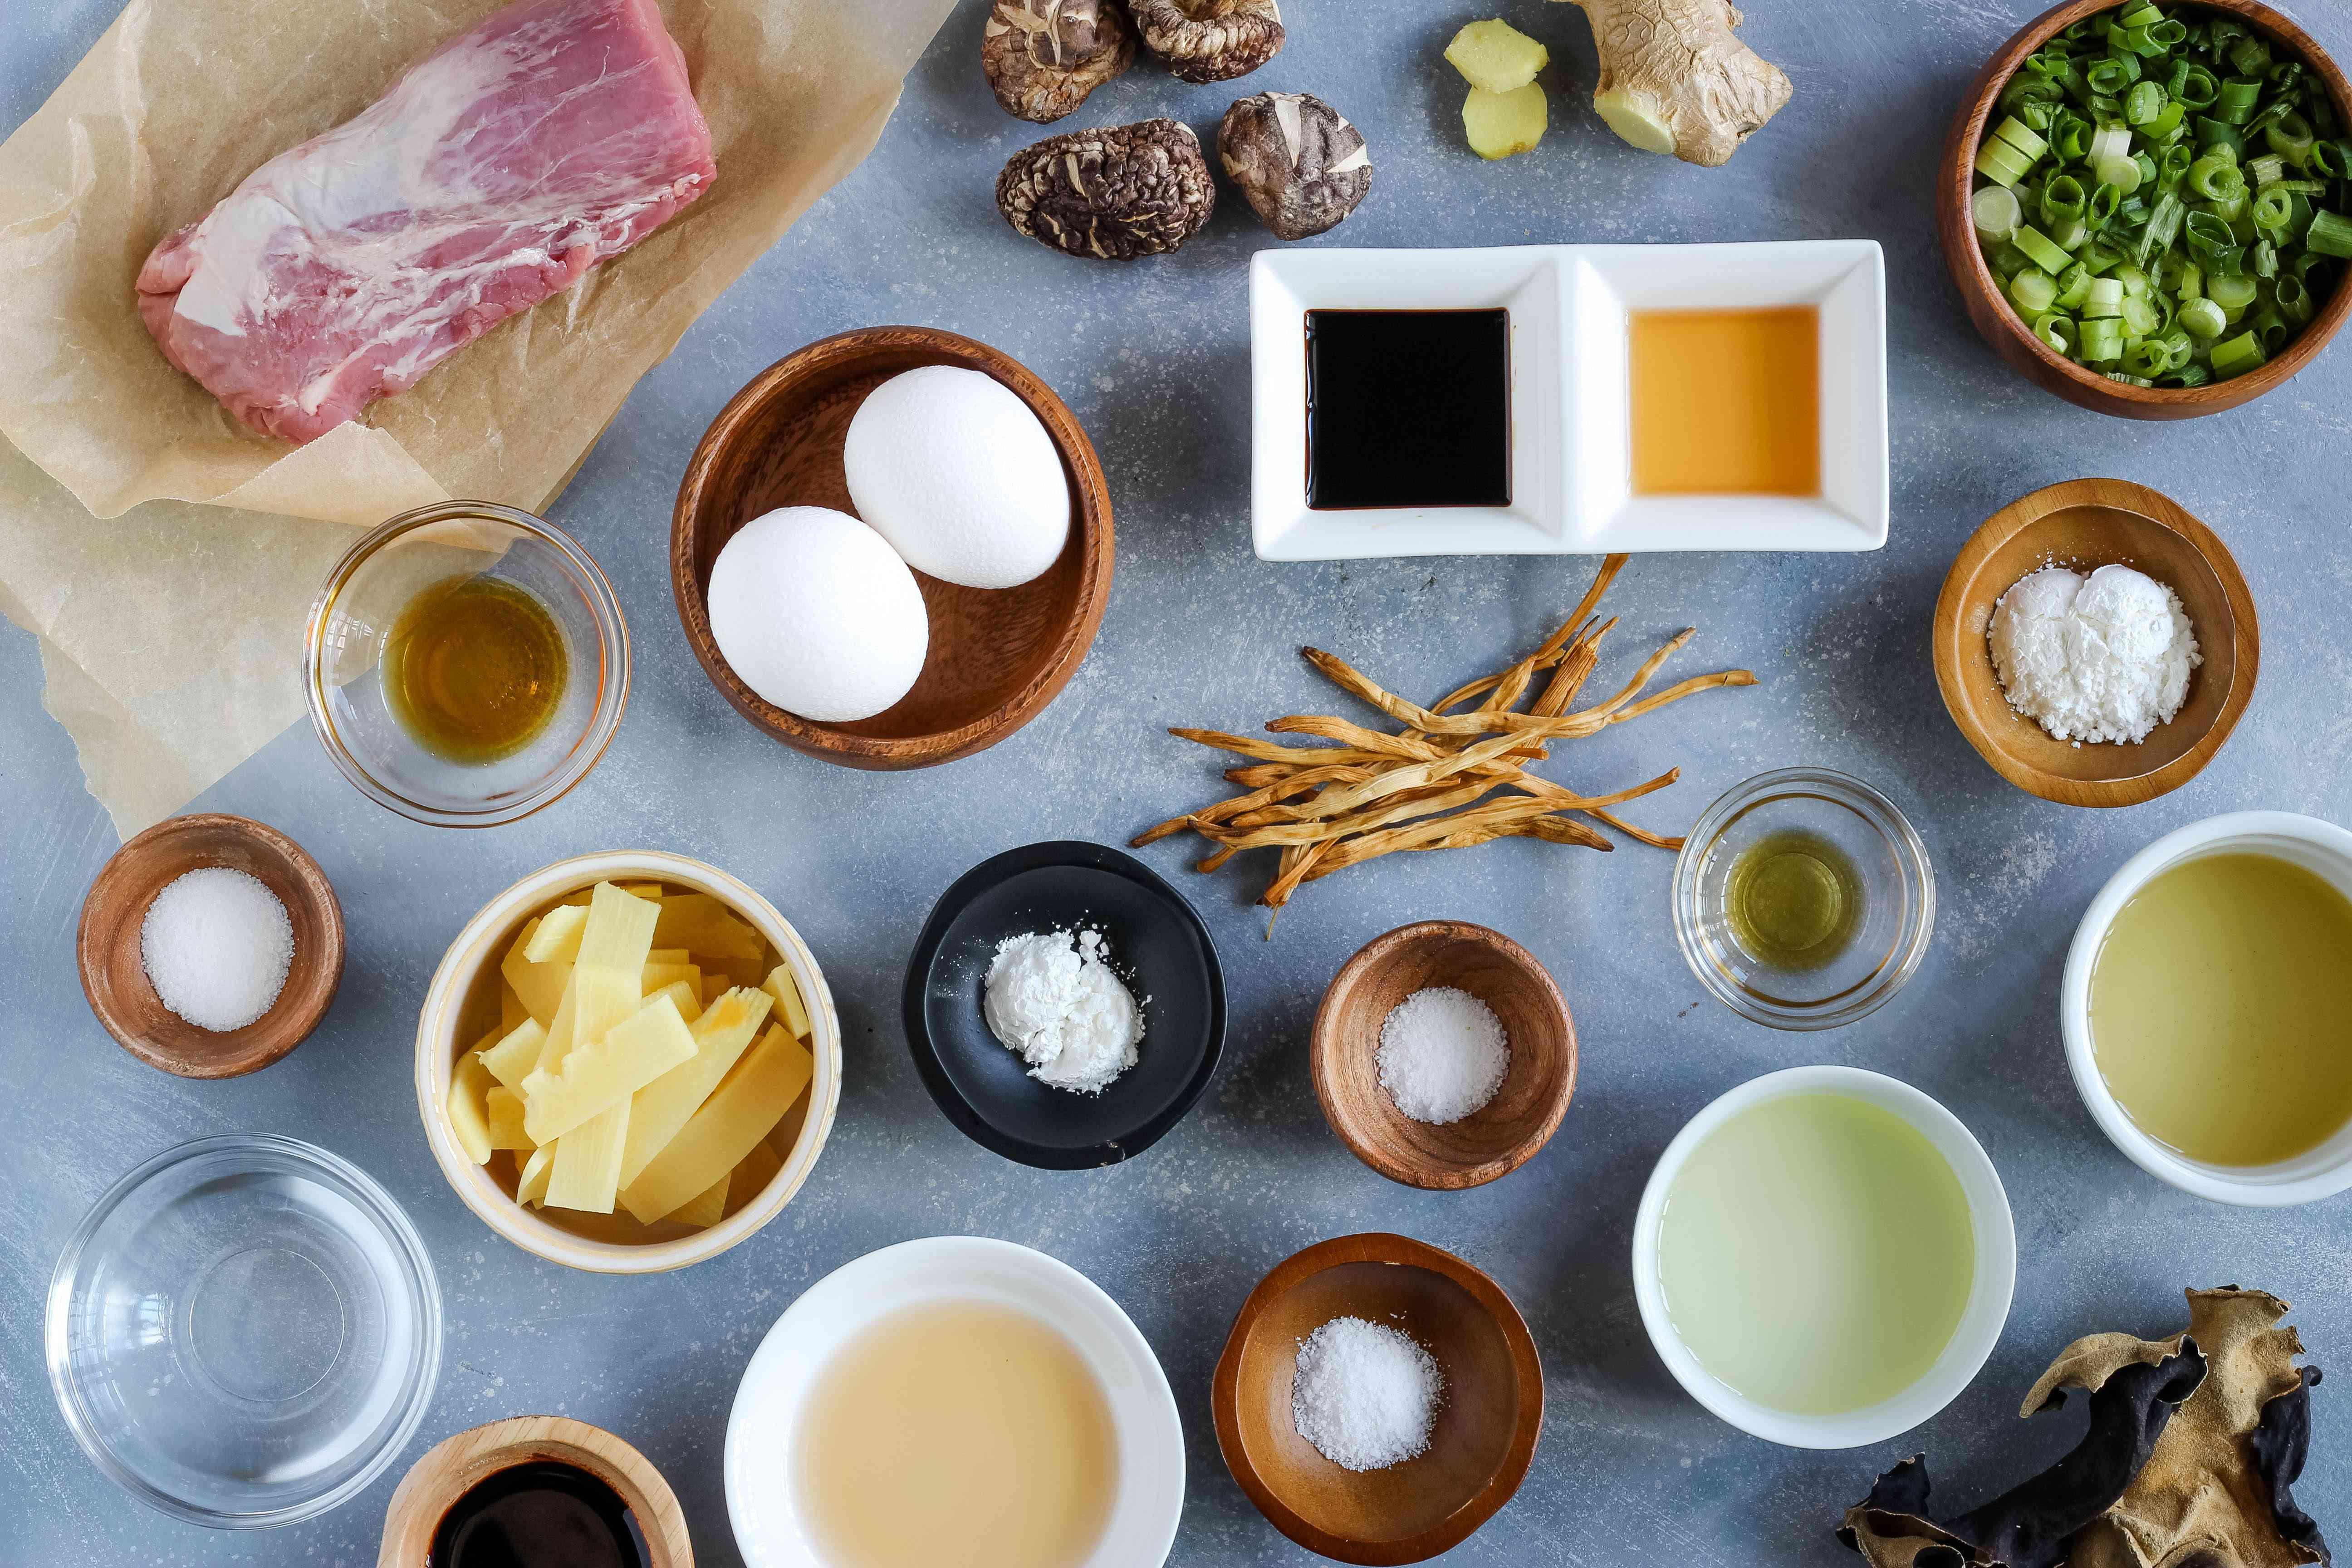 Ingredients for mu shu pork